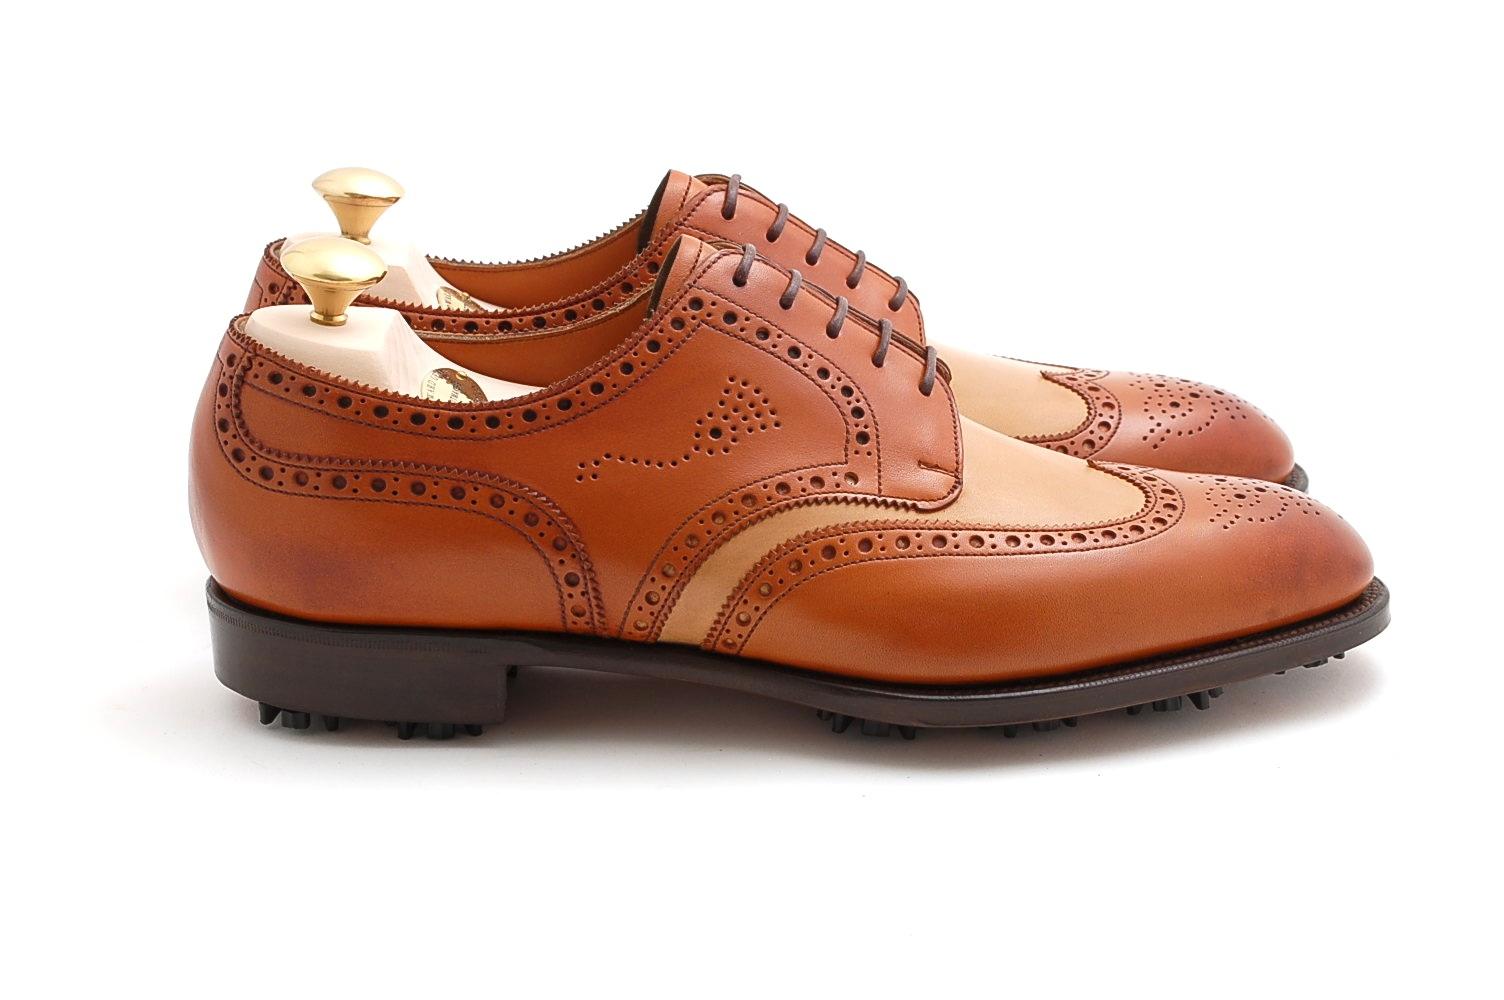 Edward Green Golf Shoes